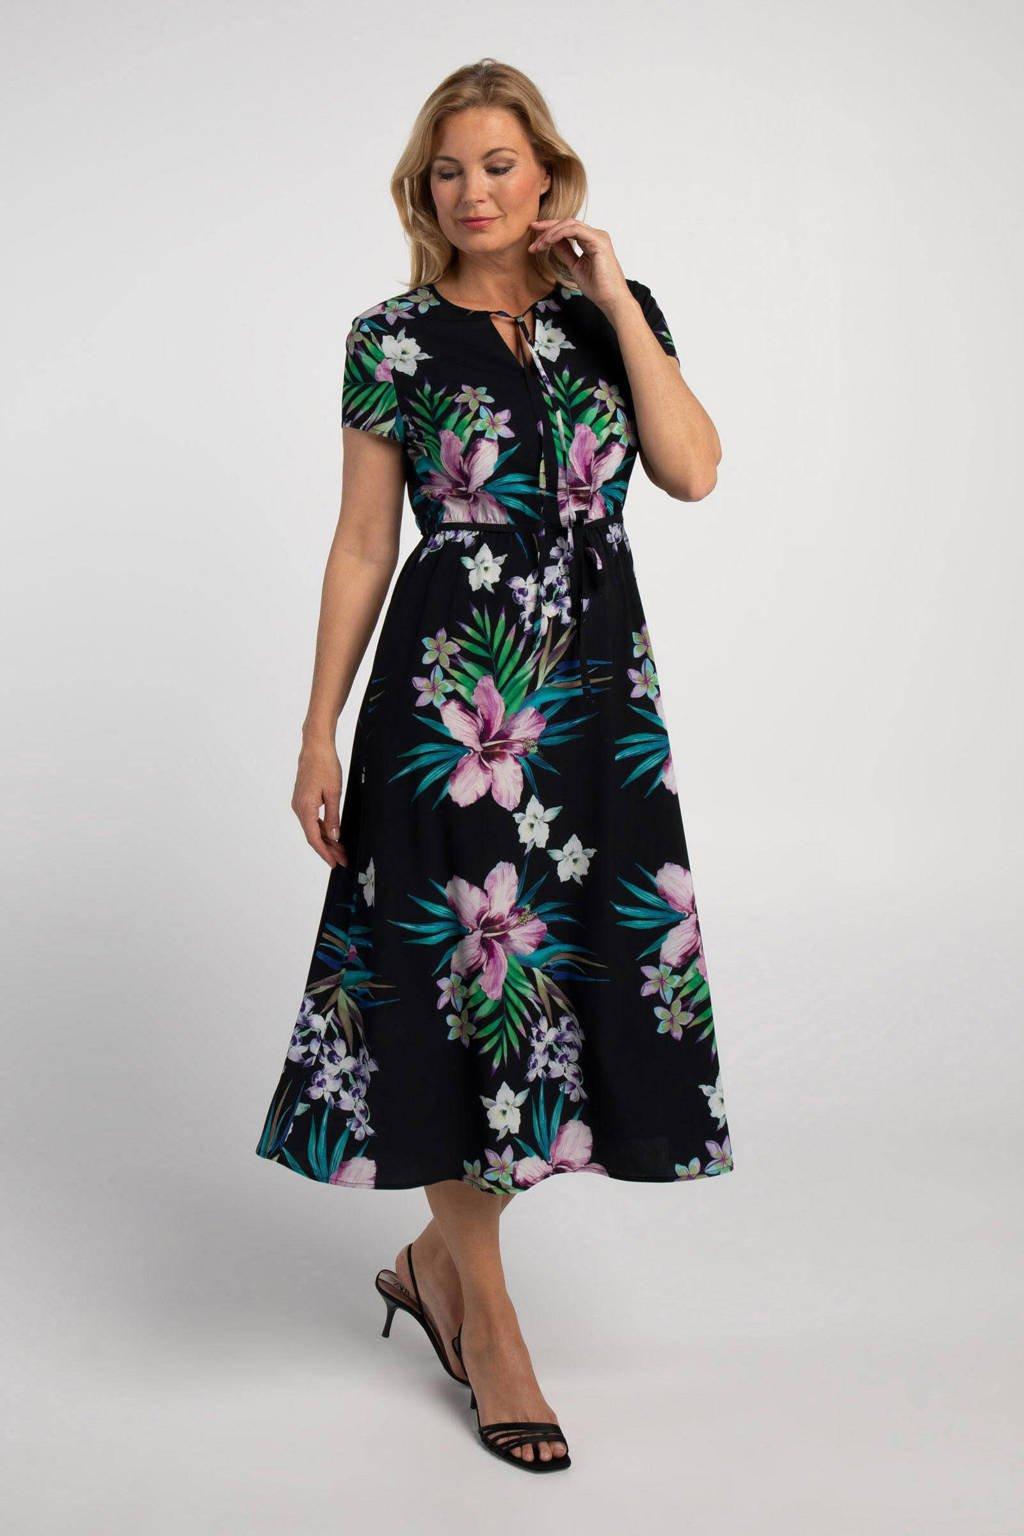 PROMISS gebloemde maxi jurk donkerblauw/multi, Donkerblauw/multi